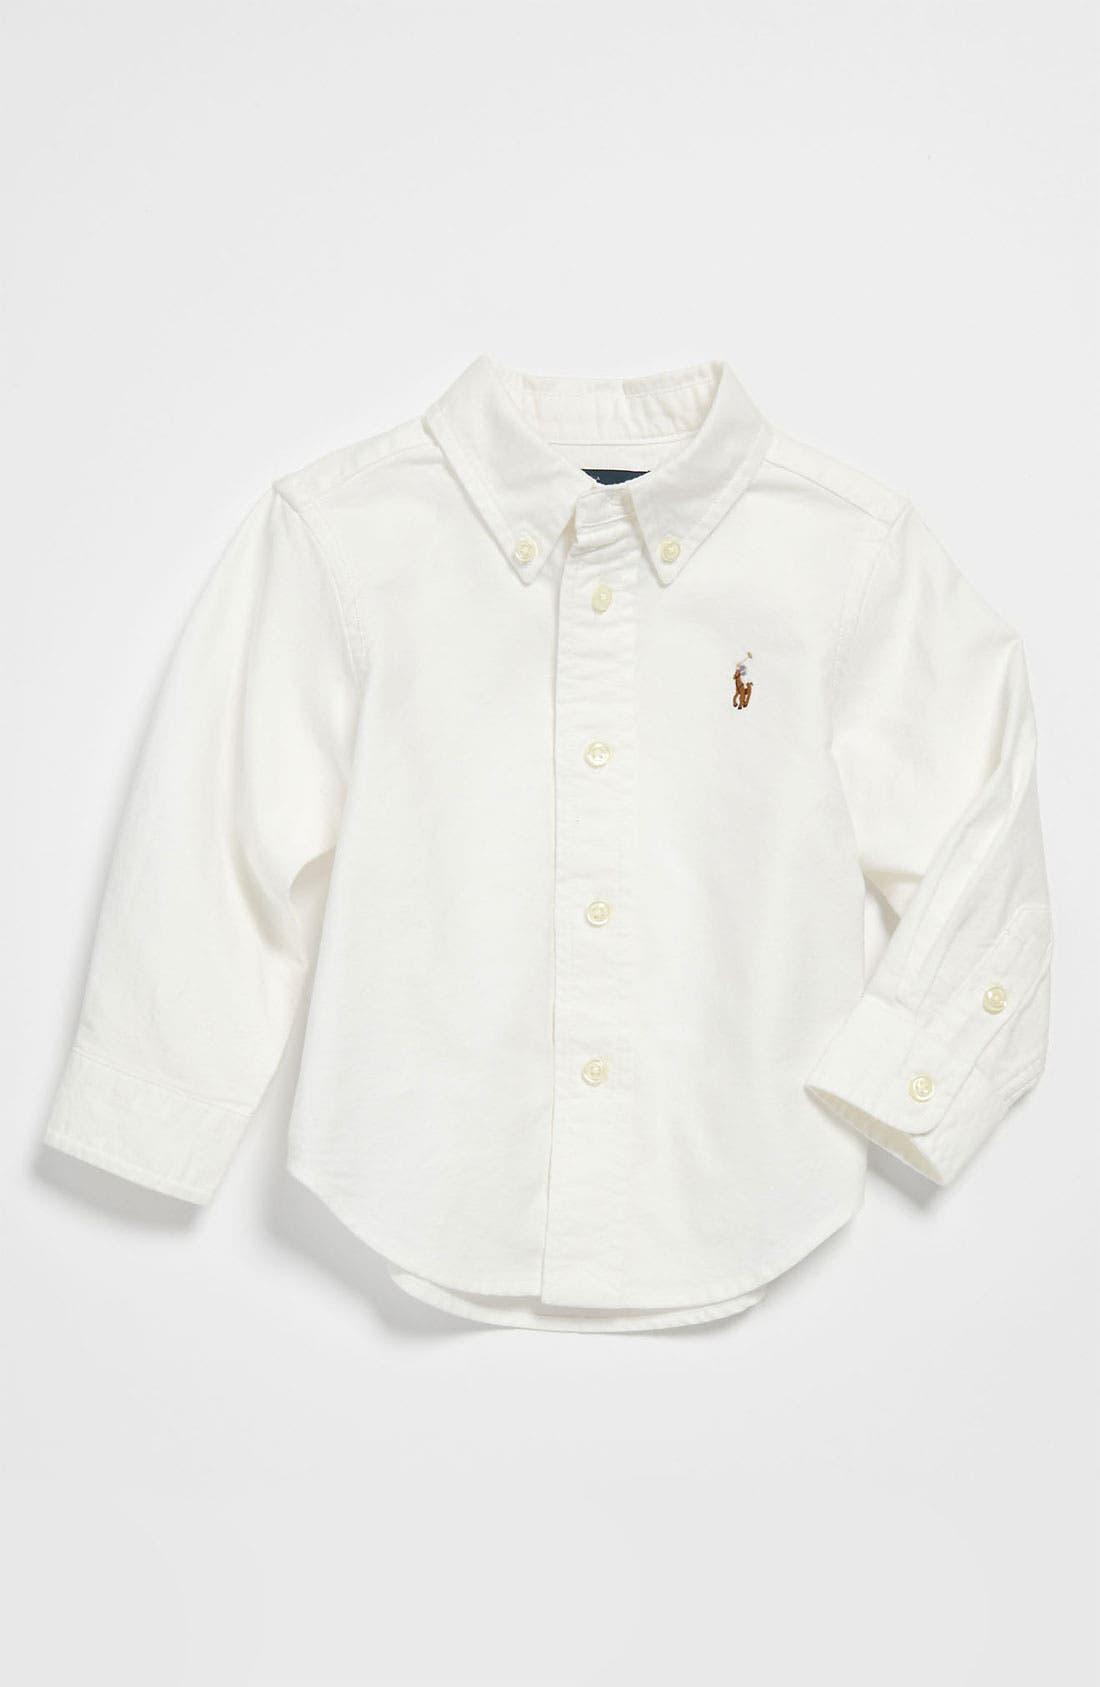 Alternate Image 1 Selected - Ralph Lauren Woven Shirt (Toddler)